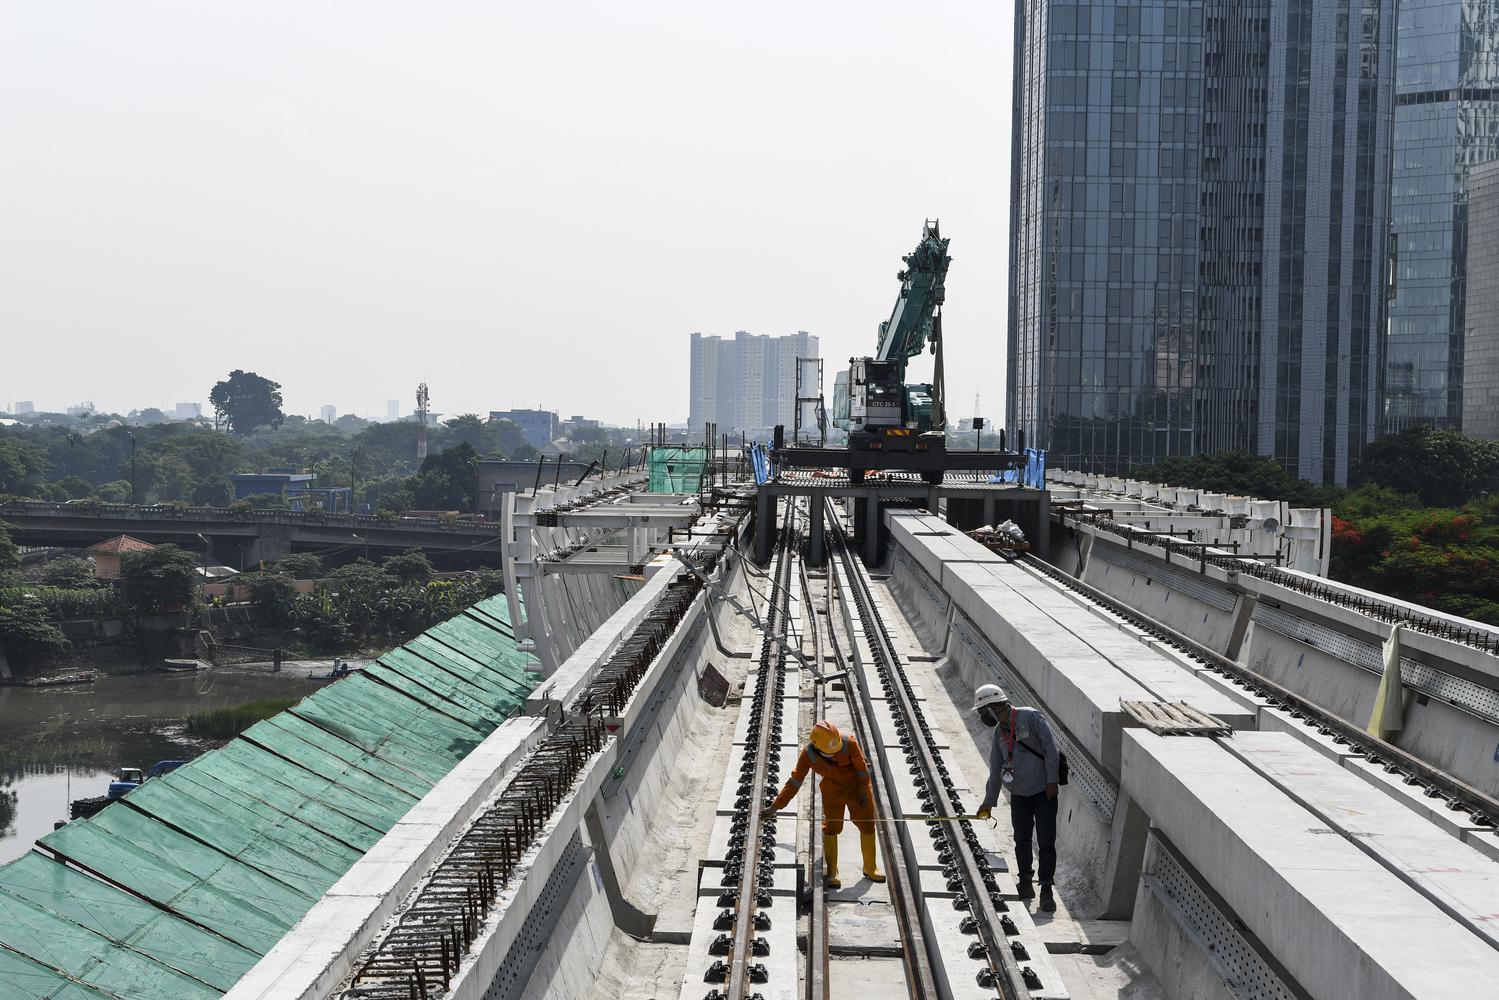 Dua orang pekerja menyelesaikan proyek pembangunan 'longspan' atau jembatan bentang panjang lintasan 'Light Rail Transit (LRT)' di kawasan Dukuh Atas, Jakarta, Rabu (11/11/2020). PT Adhi Karya (Persero) Tbk telah menyelesaikan pembangunan longspan terakhir sepanjang 218 meter yang menghubungkan lintasan LRT dari Cawang-Kuningan-Dukuh Atas.